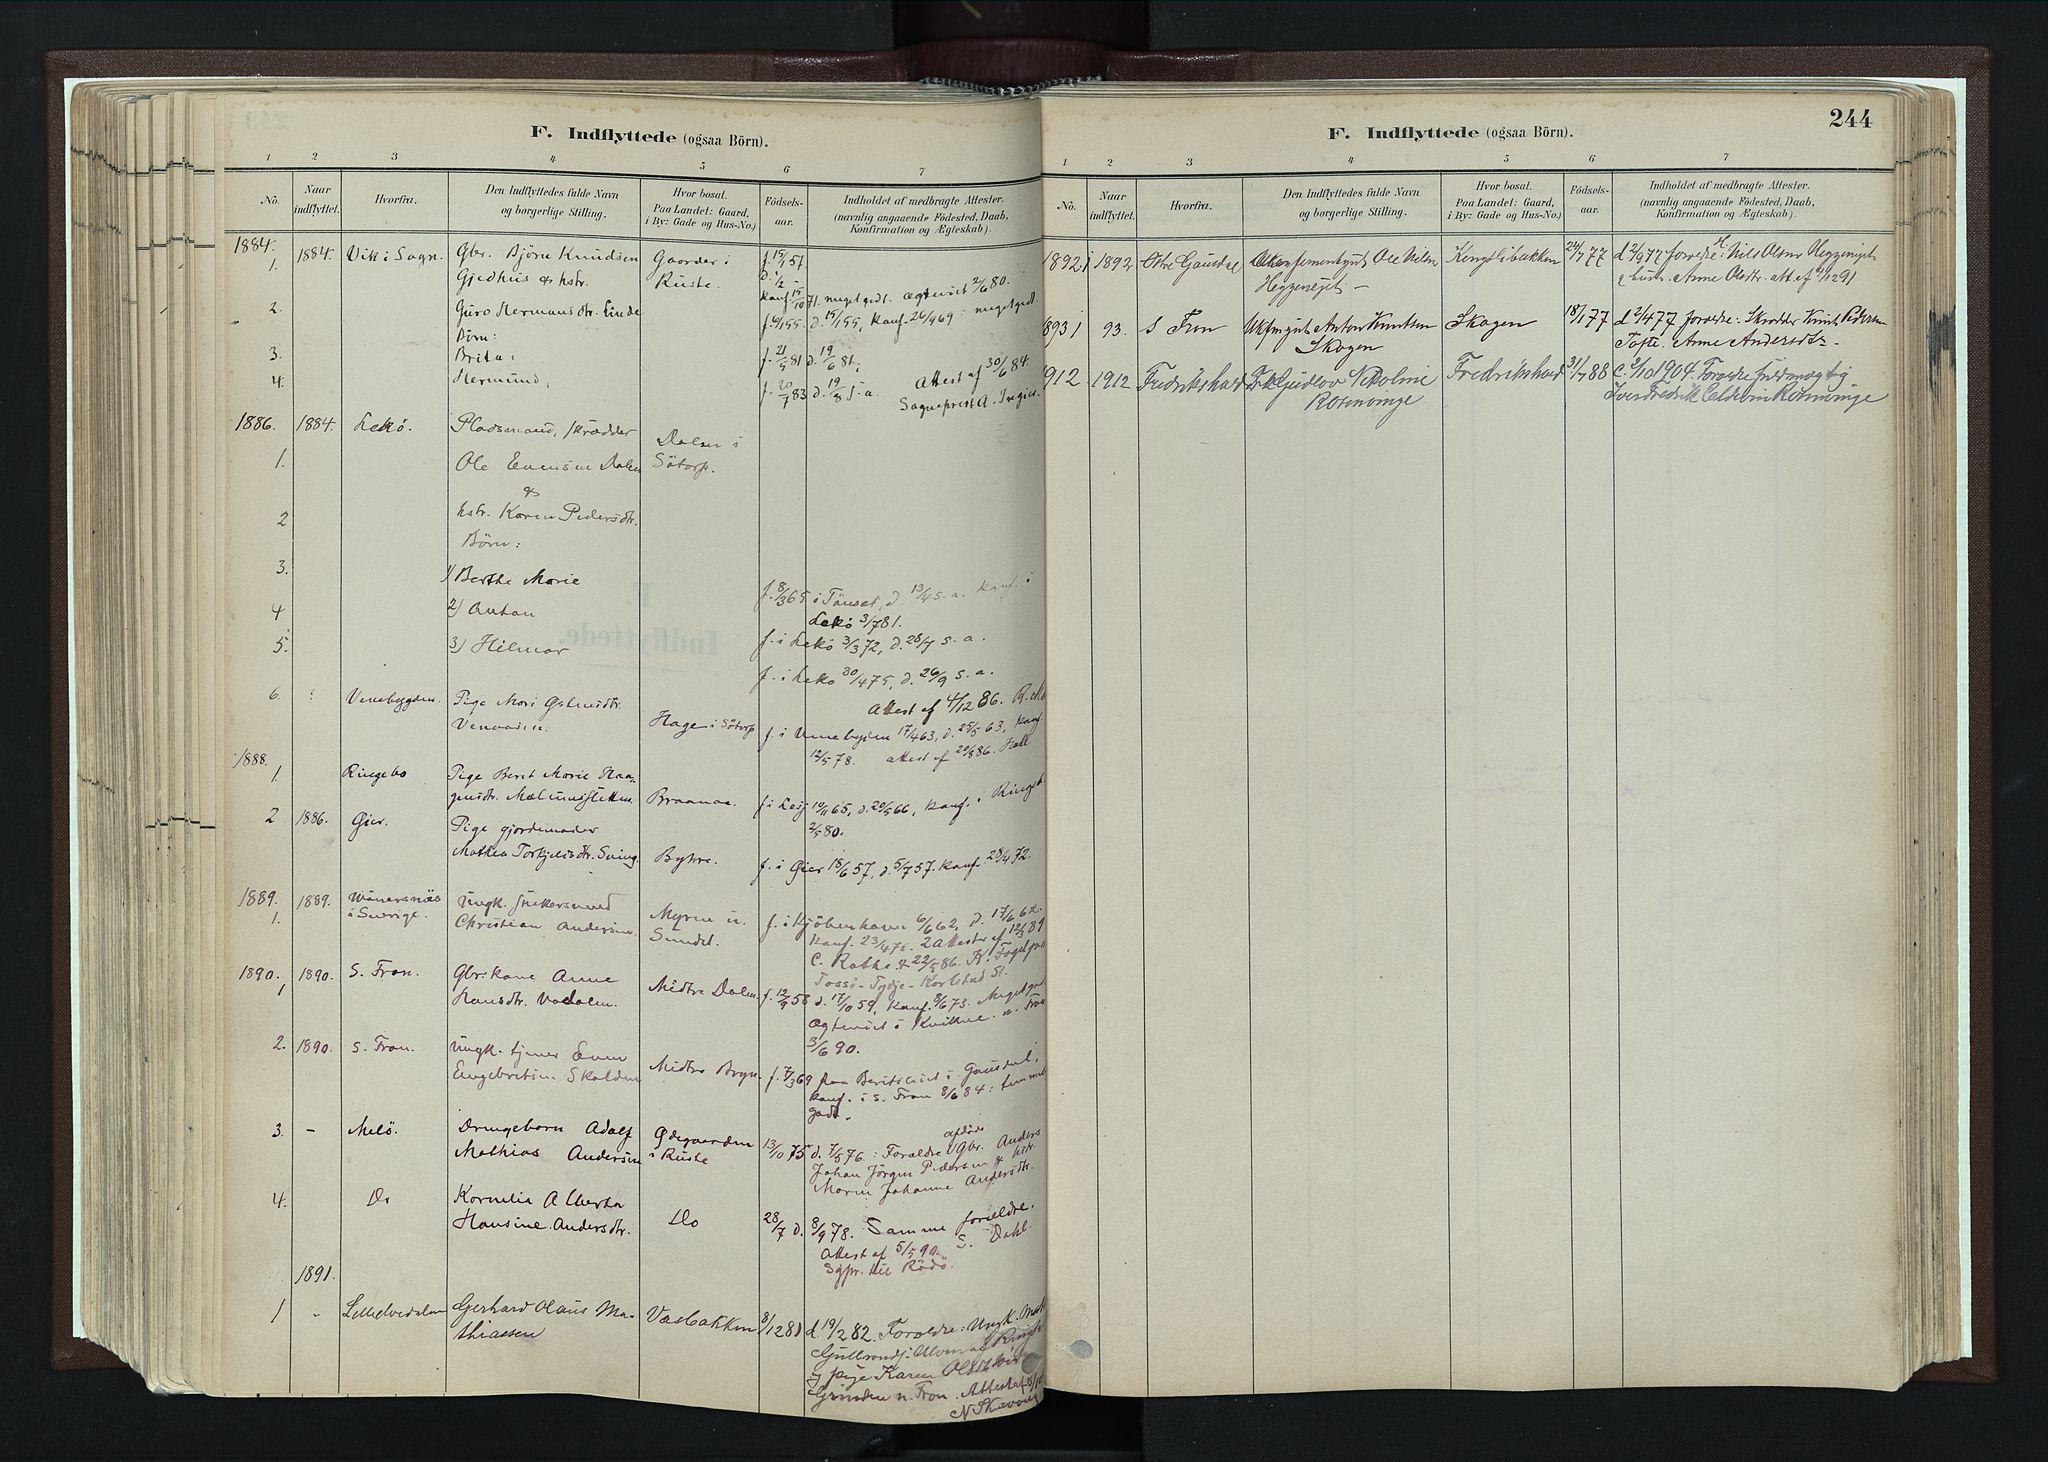 SAH, Nord-Fron prestekontor, Ministerialbok nr. 4, 1884-1914, s. 244